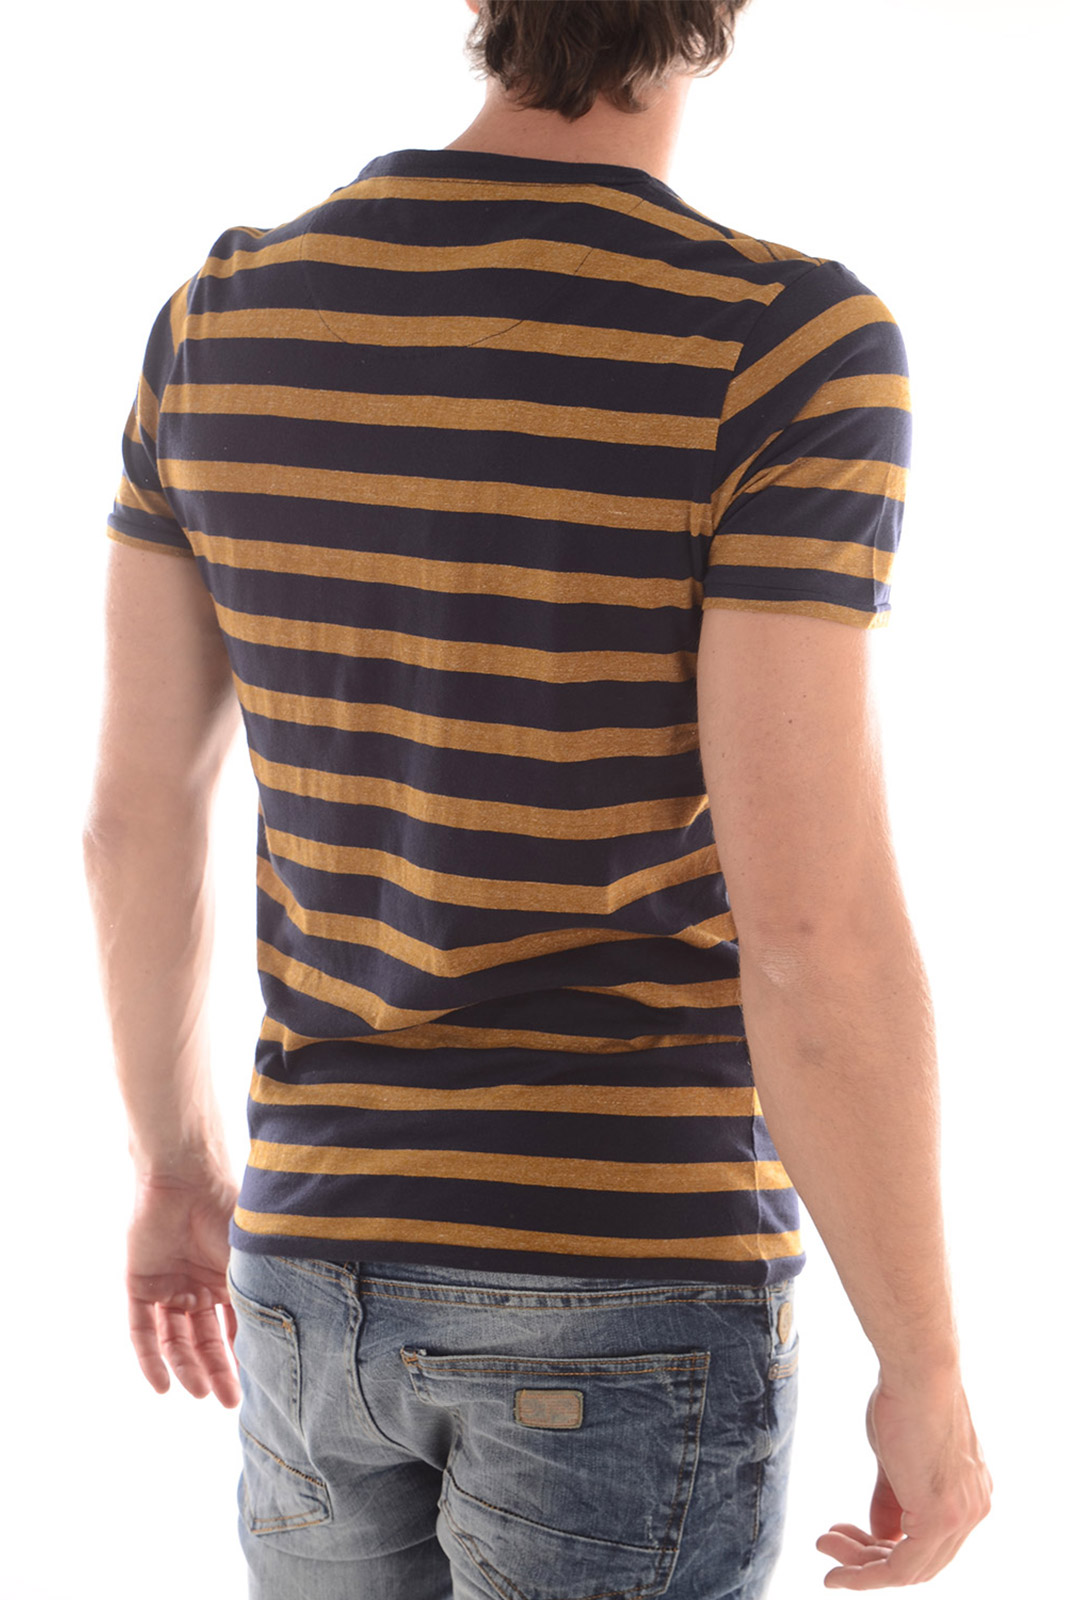 Tee-shirts  Selected ANTON SS O NECK H GOLDEN BROWN NAVY